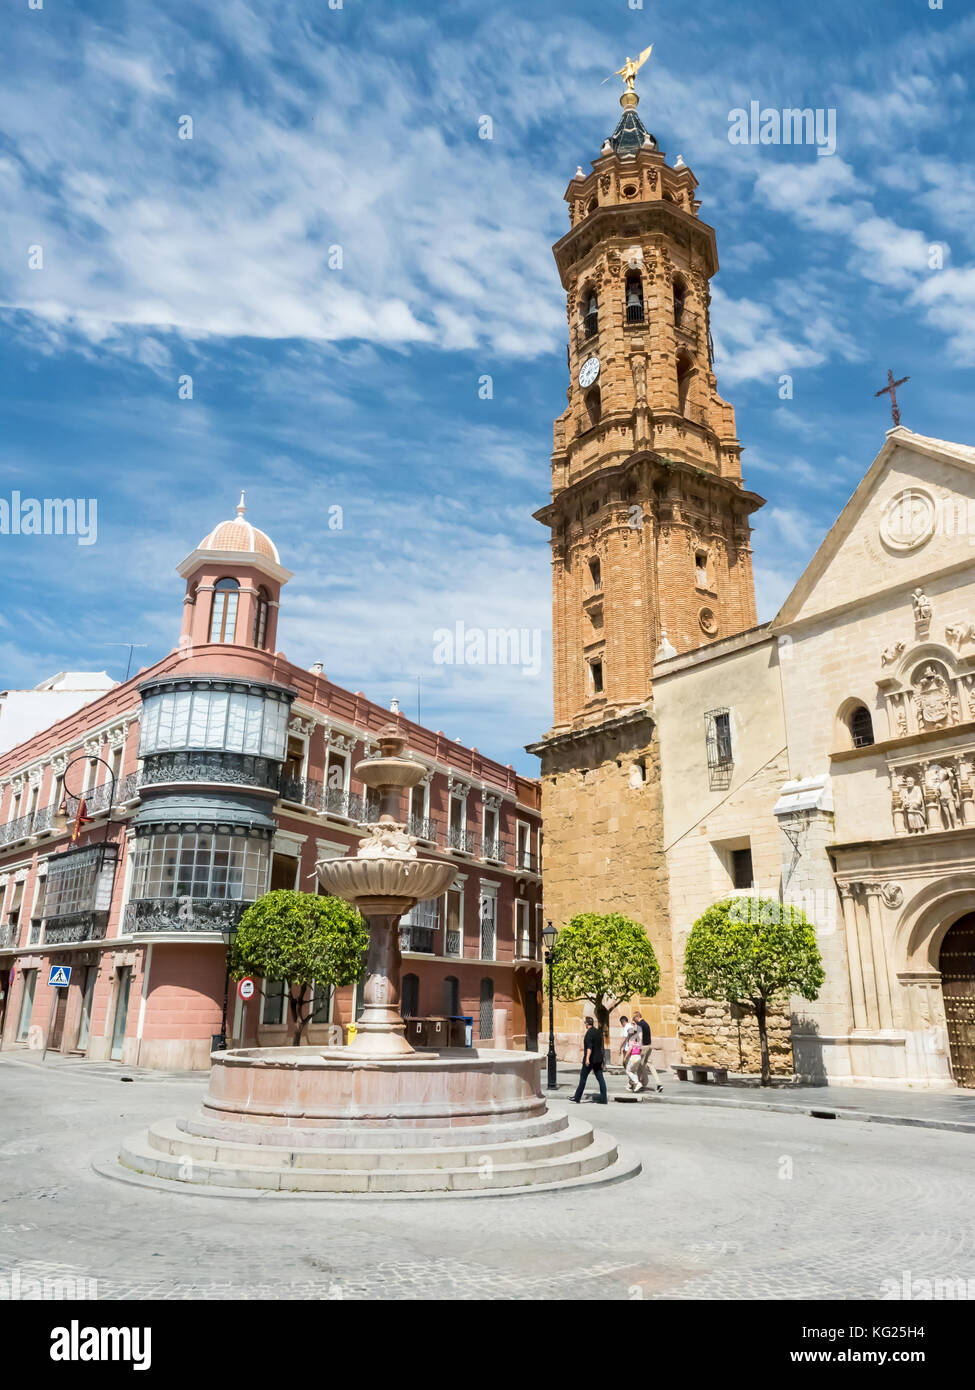 The 16th century church of San Sebastian, Antequera, Andalucia, Spain, Europe Stock Photo